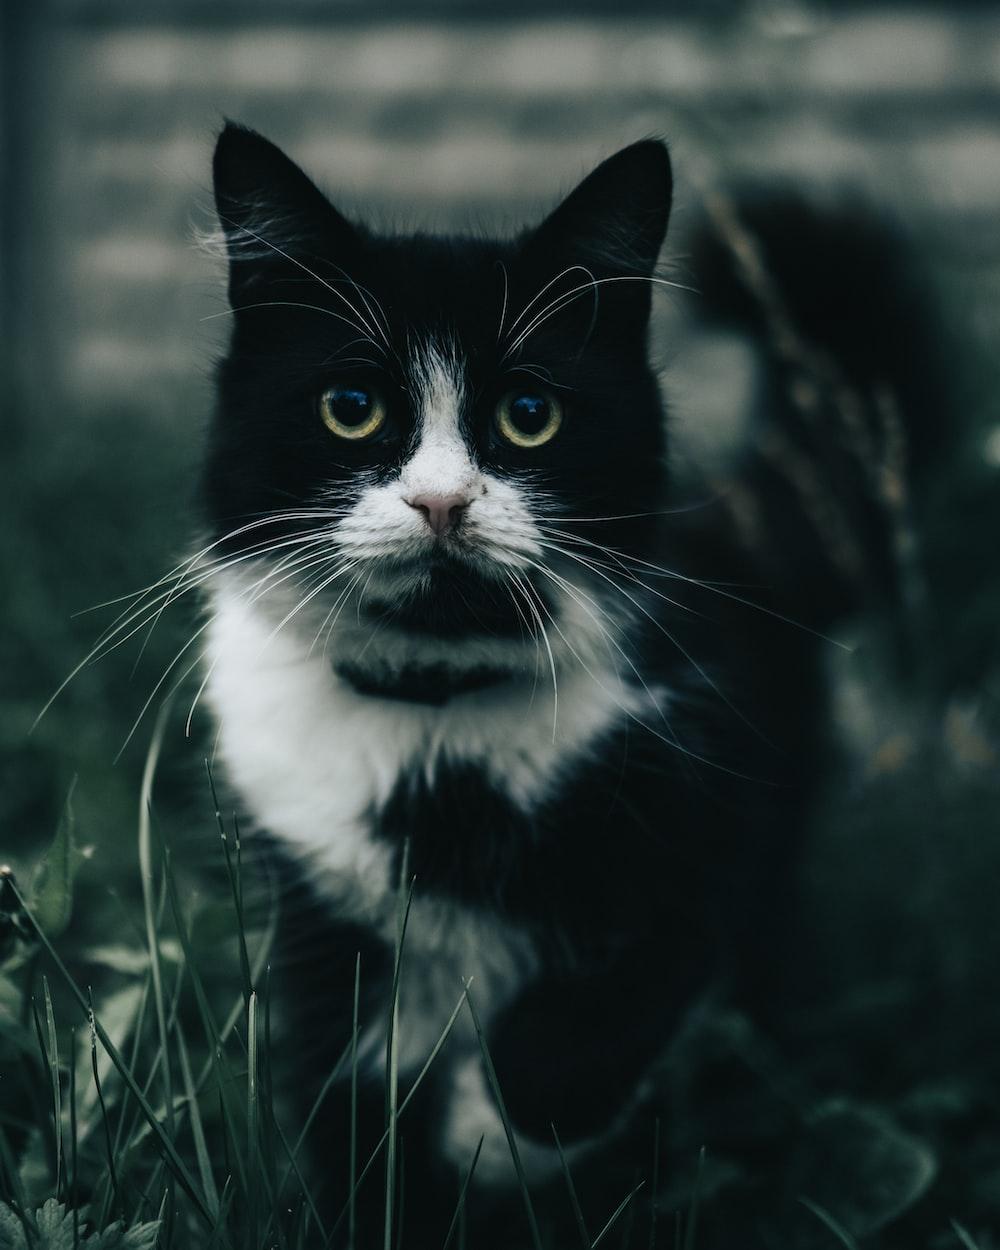 tuxedo cat on green grass